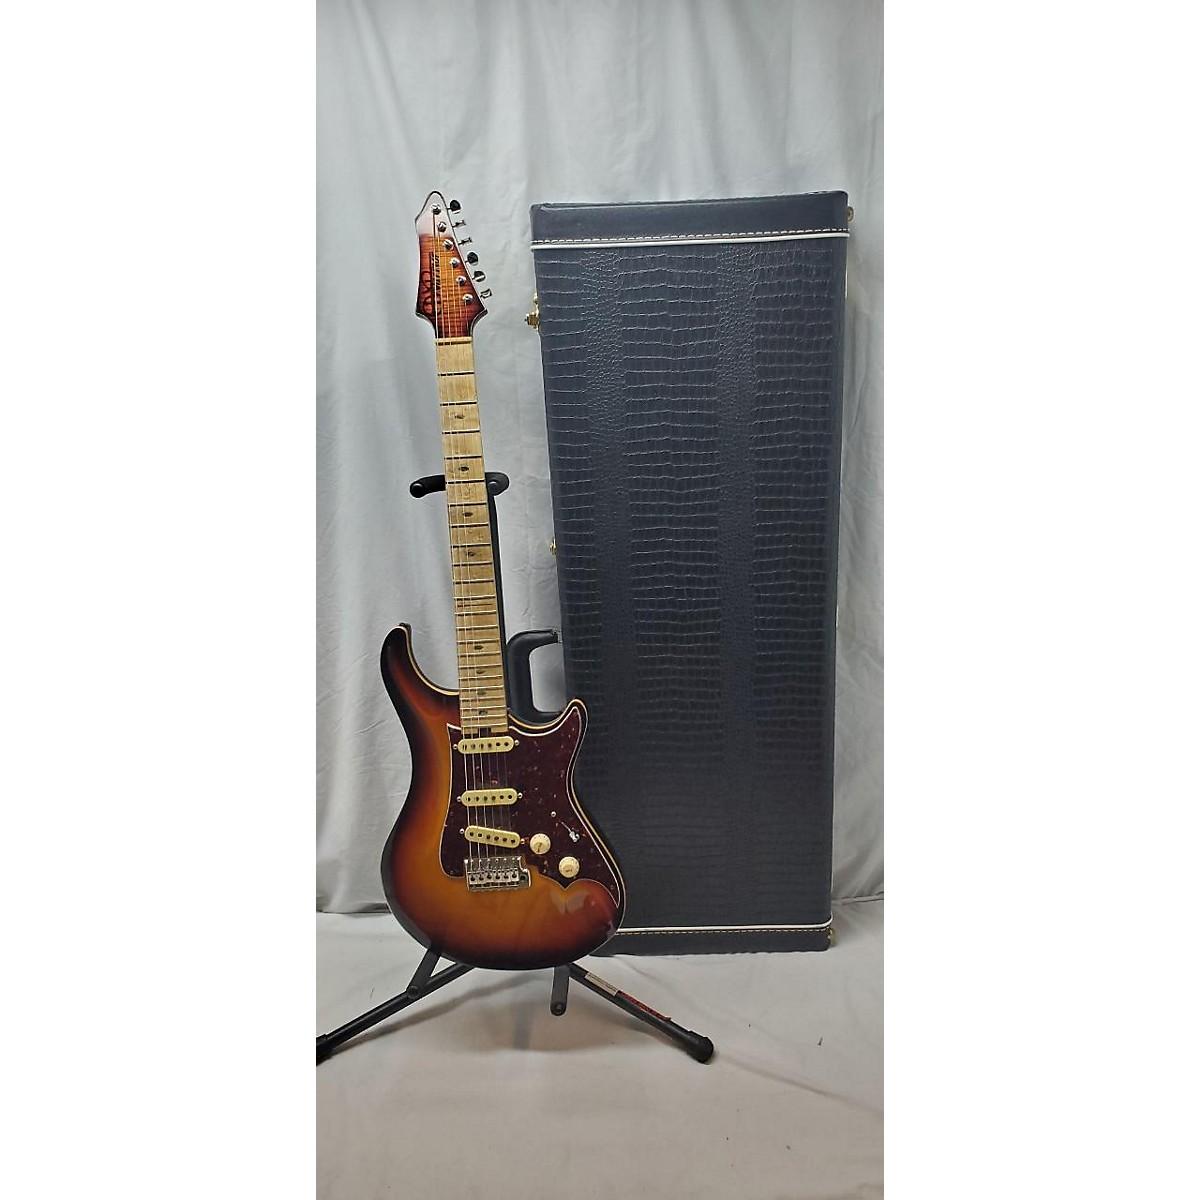 Warrior 2013 Texan '54 Solid Body Electric Guitar